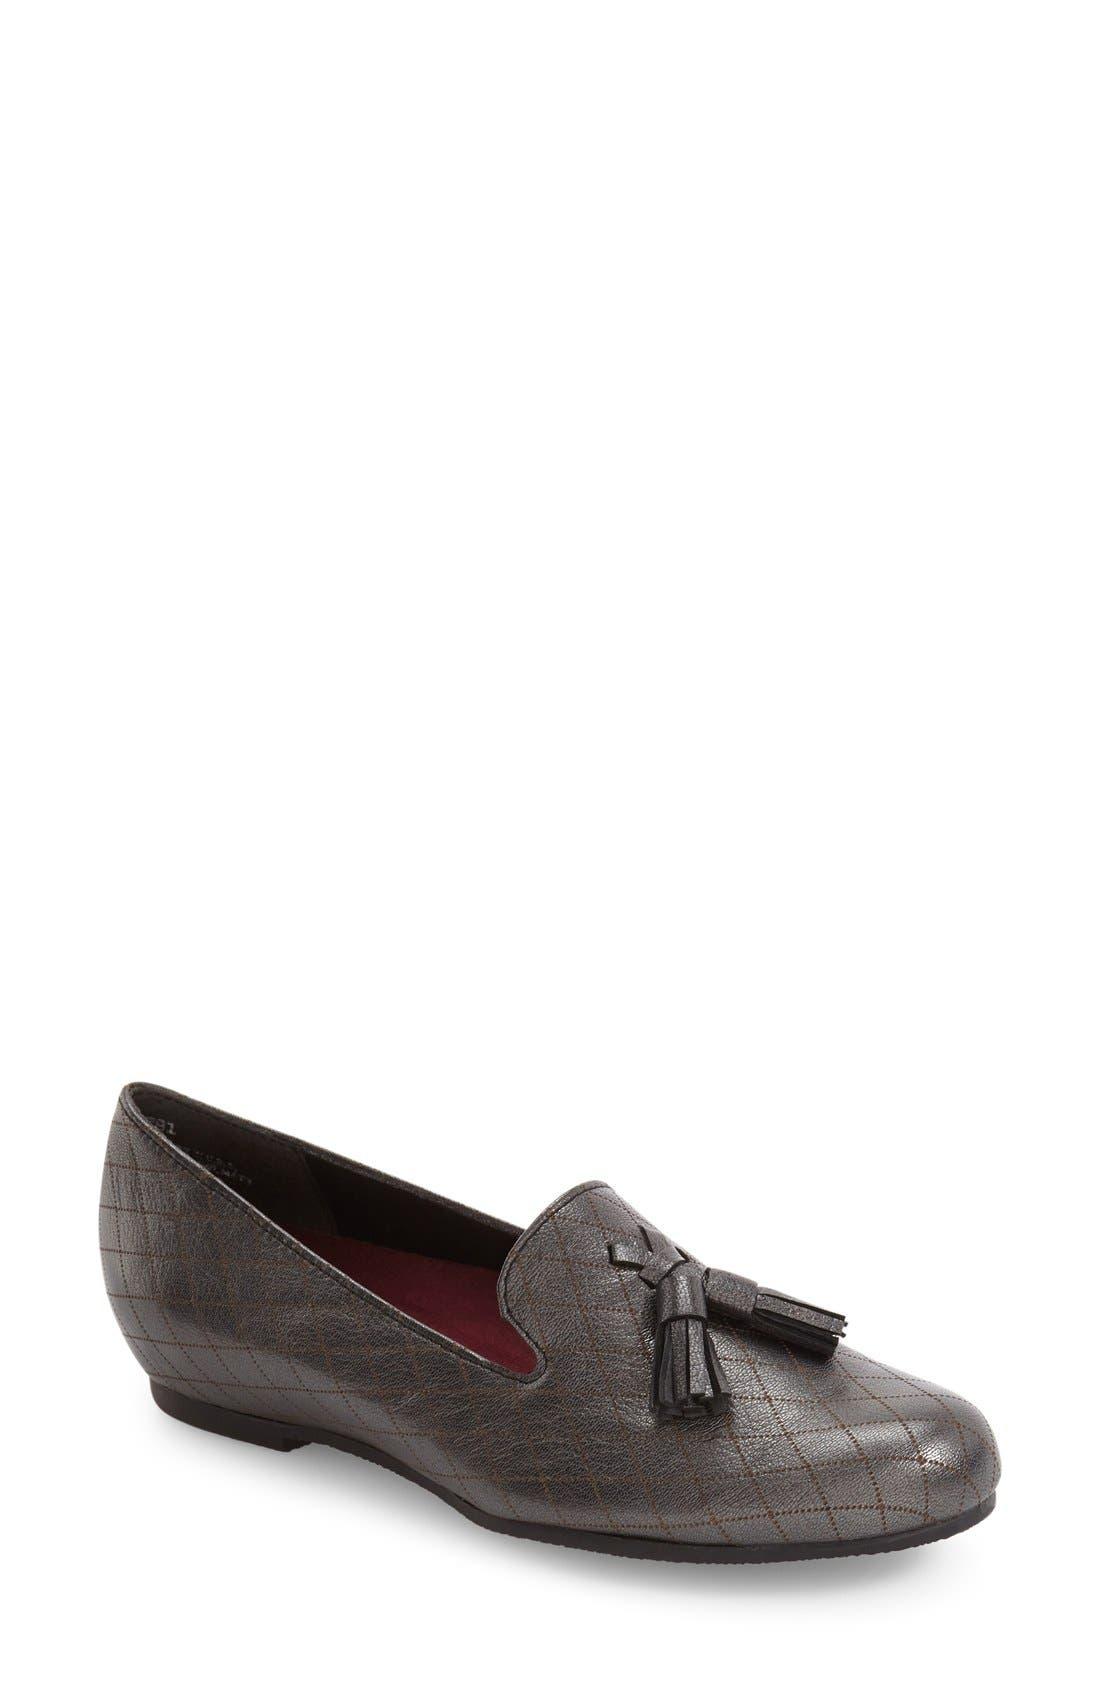 Tallie Tassel Loafer,                         Main,                         color, Black Graphite Leather